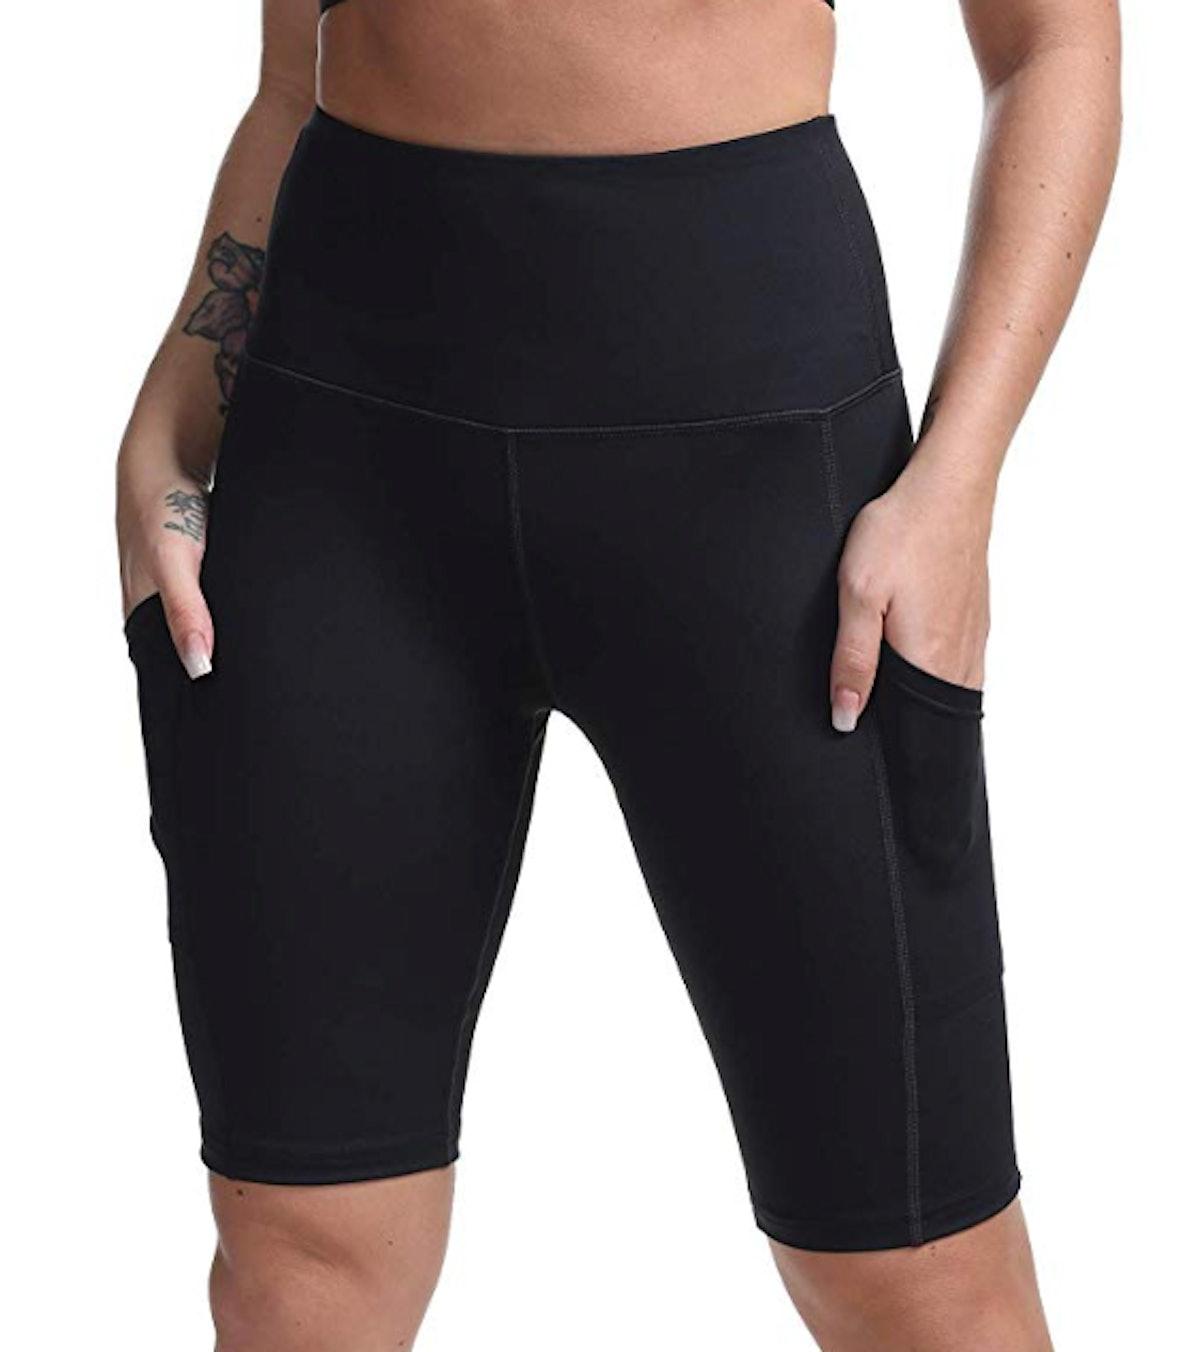 DILANNI High Waist Athletic Shorts